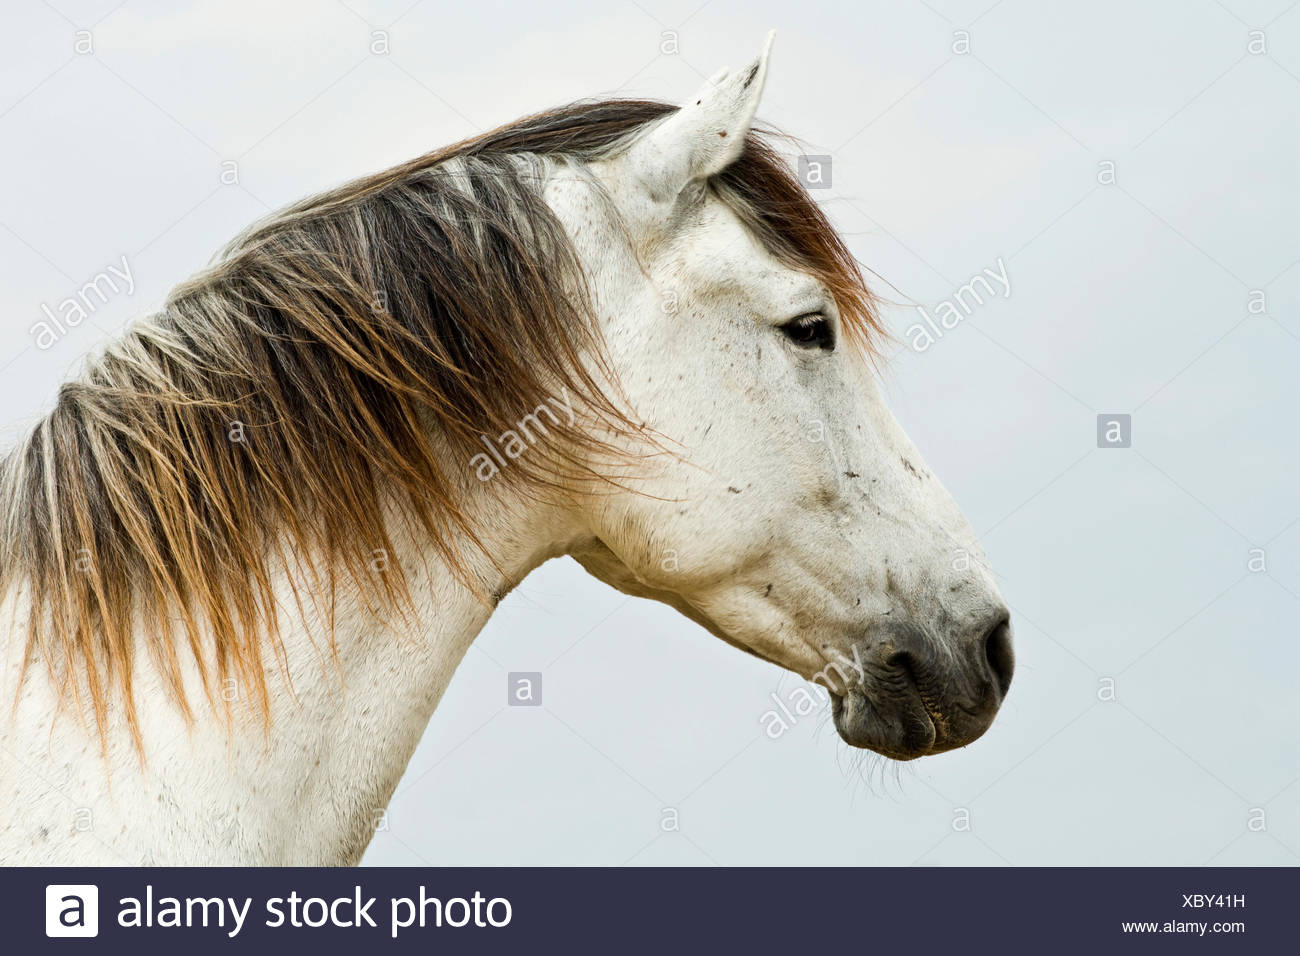 Lusitano horse, gelding, white horse, Andalusia, Spain - Stock Image